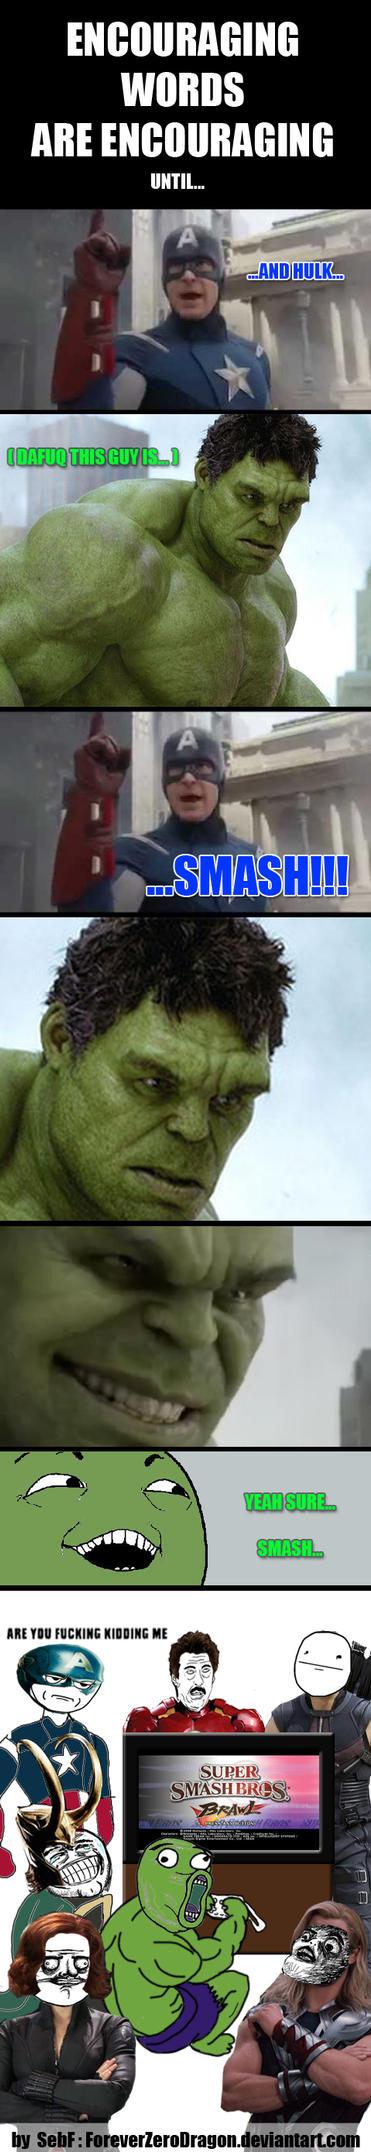 smashing_things_is_too_mainstream___avengers_meme_by_foreverzerodragon d588fm7 smashing things is too mainstream avengers meme by,Avengers Meme